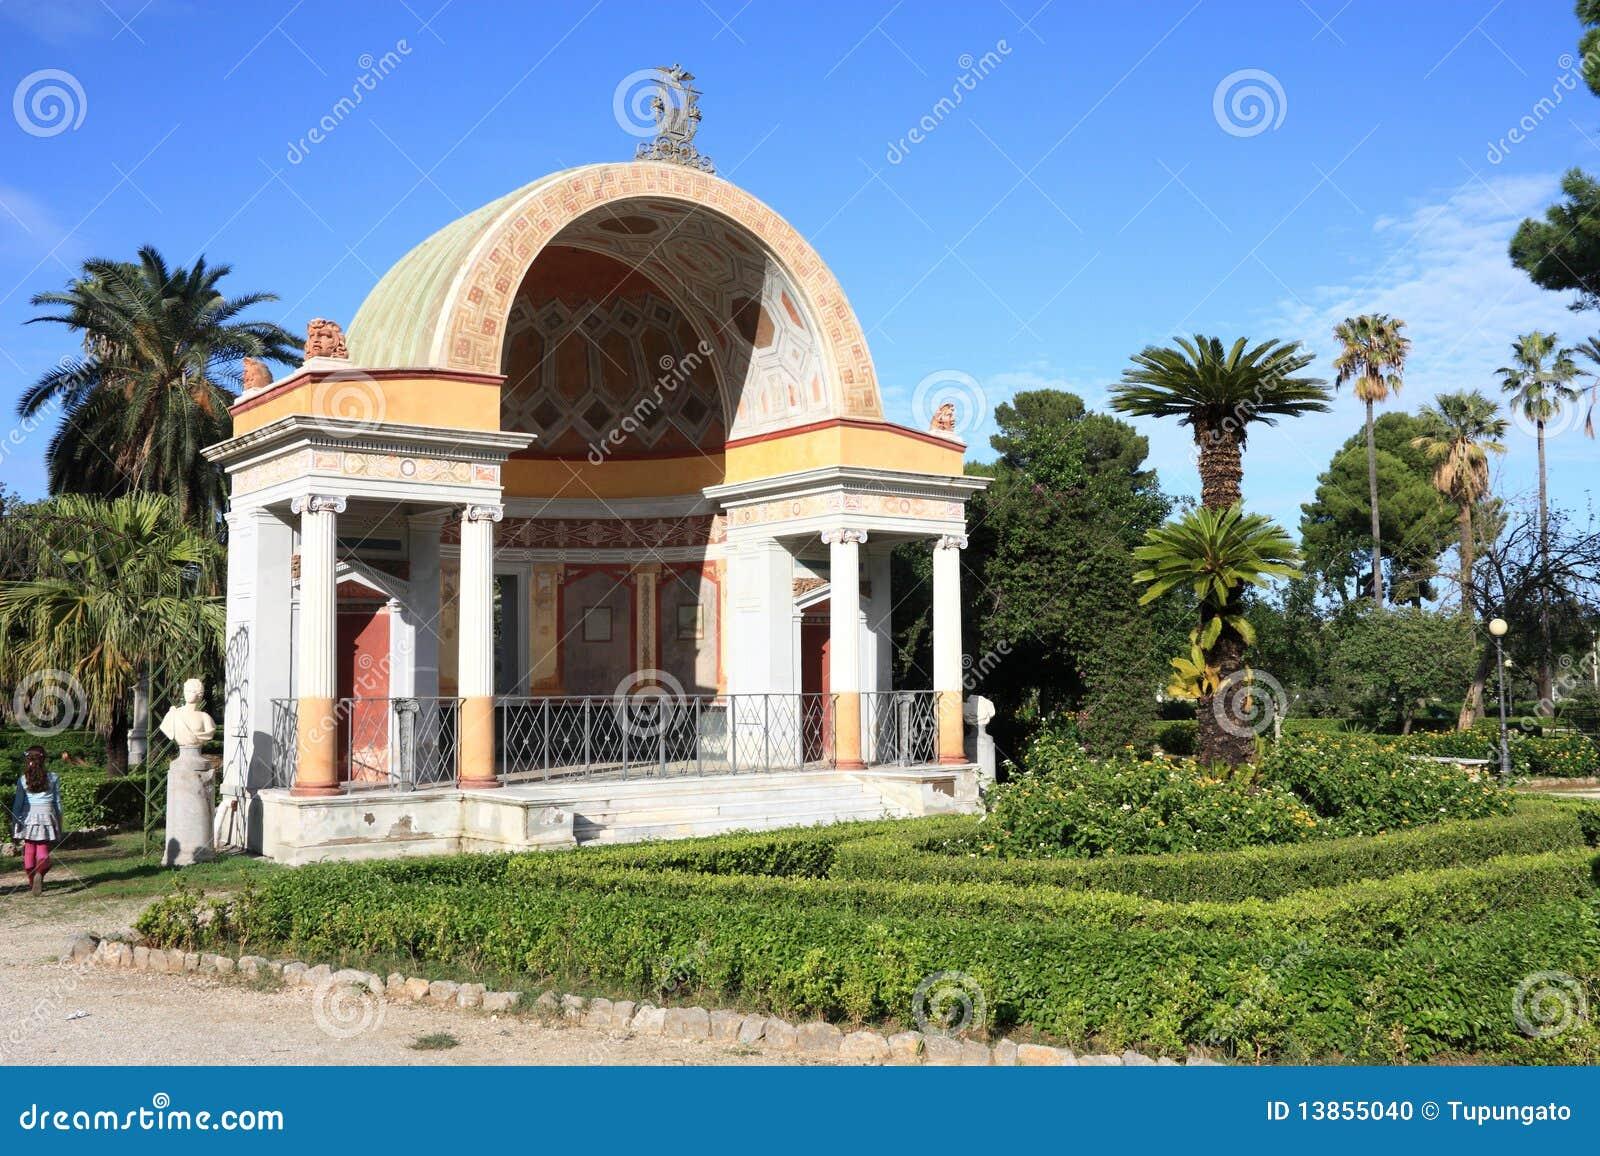 Palermo foto de archivo imagen 13855040 for Amapola jardin de infantes palermo